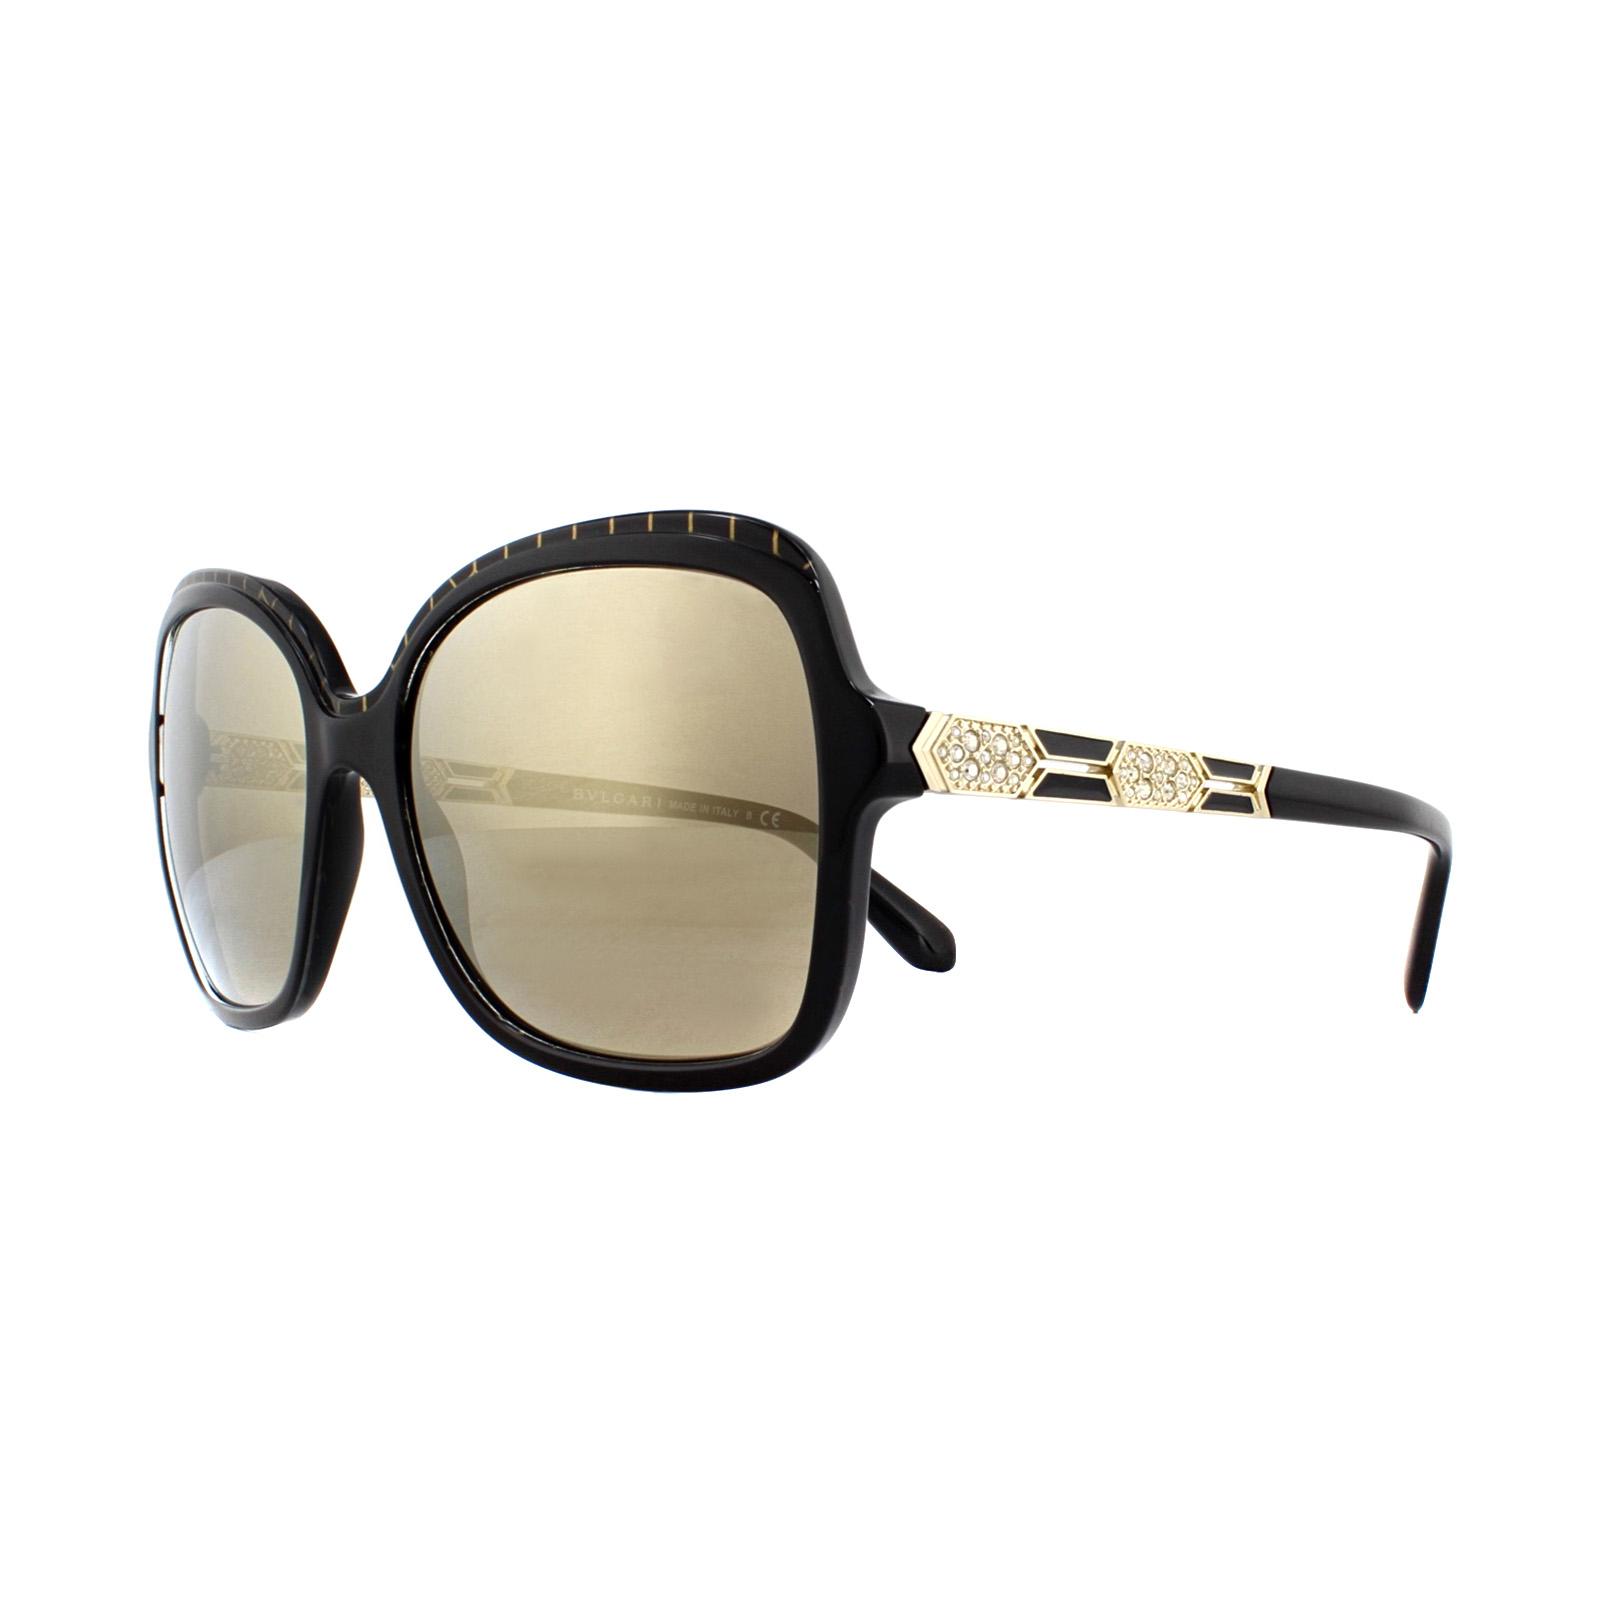 088fd8bb2d4 Sentinel Bvlgari Sunglasses BV8181B 54205A Black Pattern Gold Brown Mirror  Gold